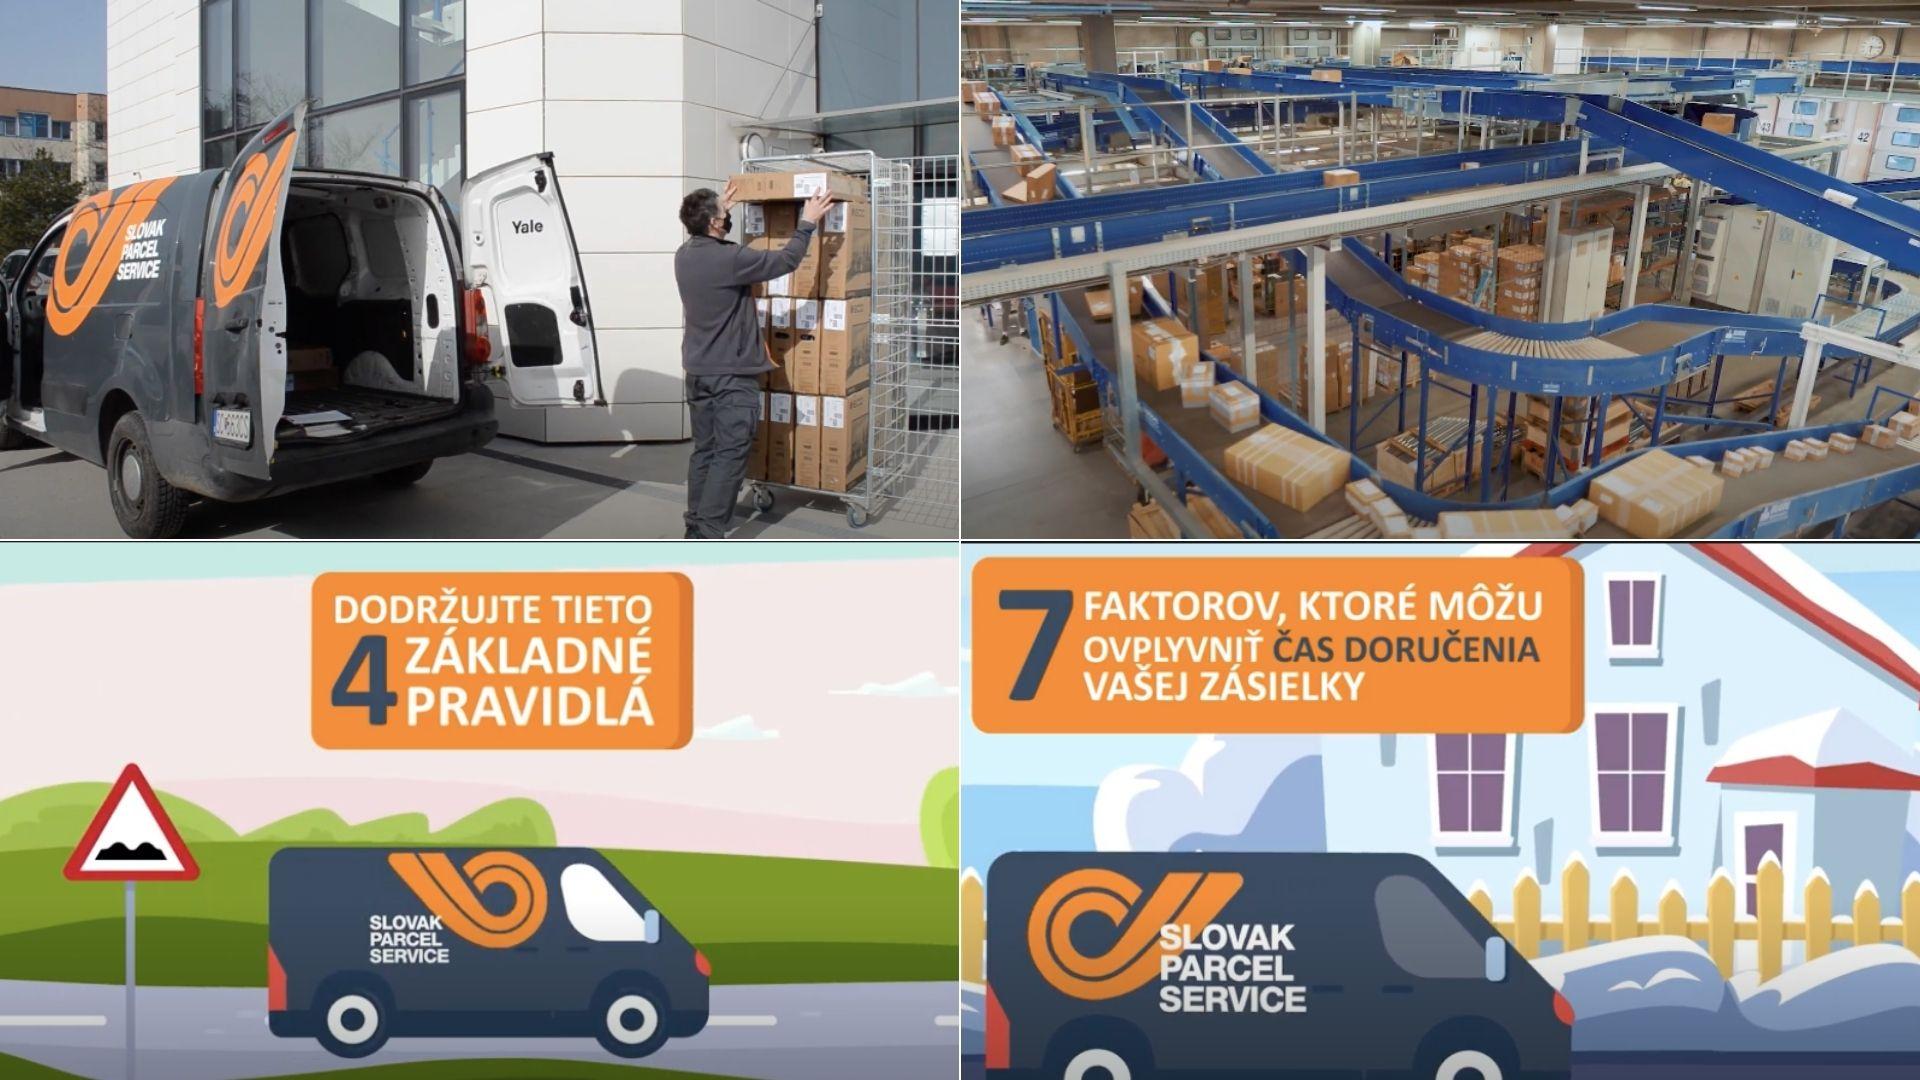 slovak-parcel-service-kurier-video-grape-pr